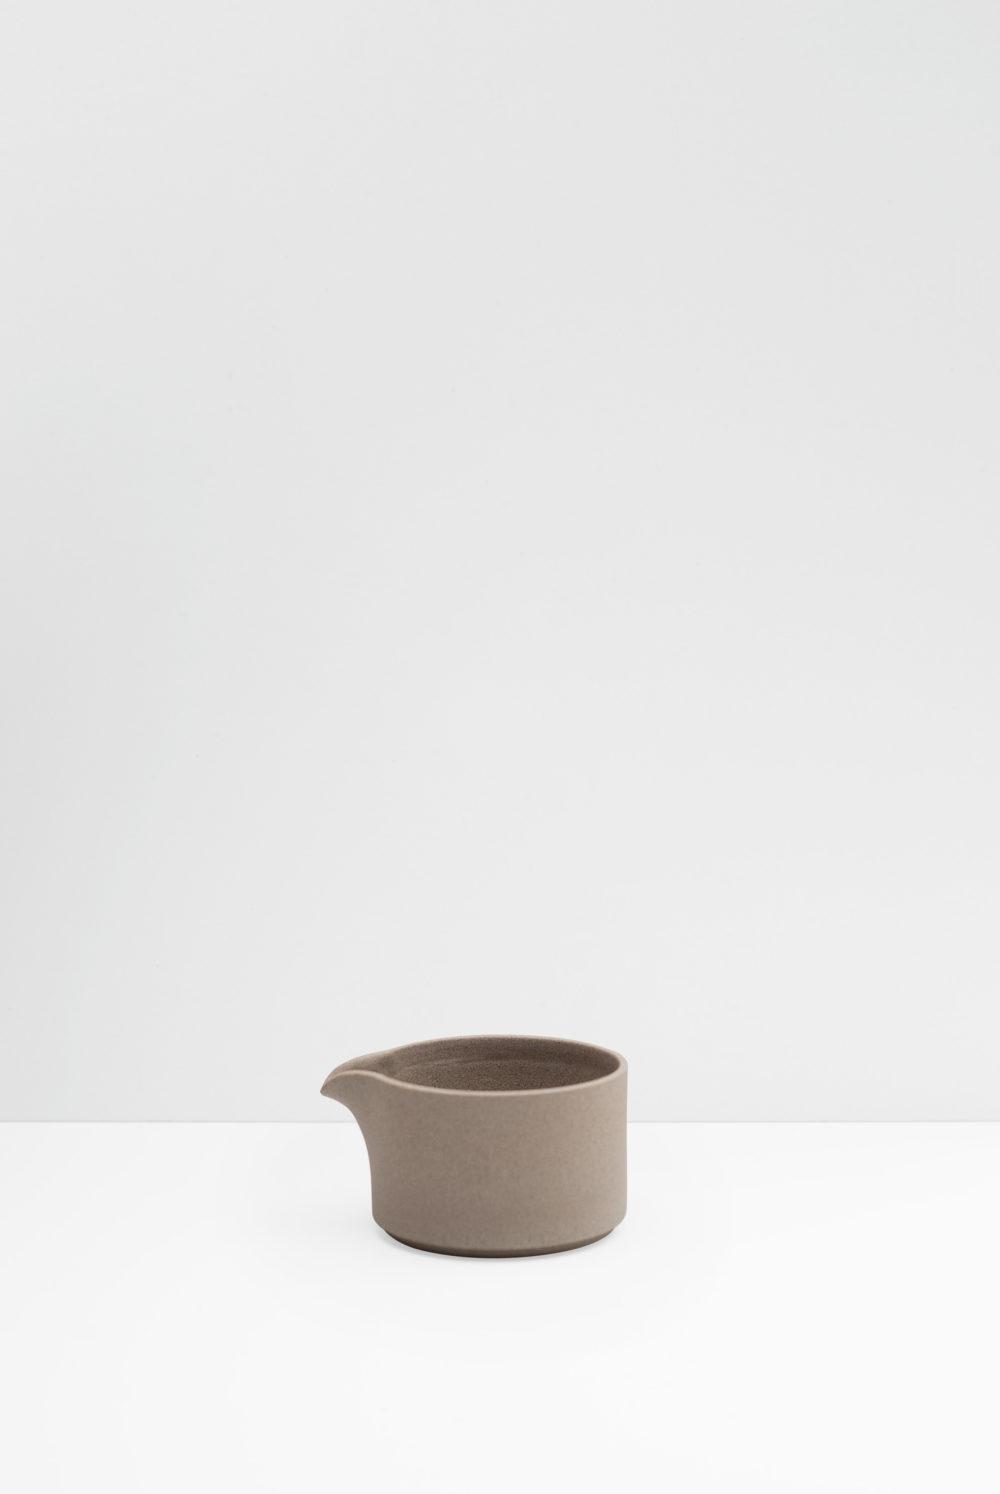 Hasami Porcelain milk pitcher natural matte